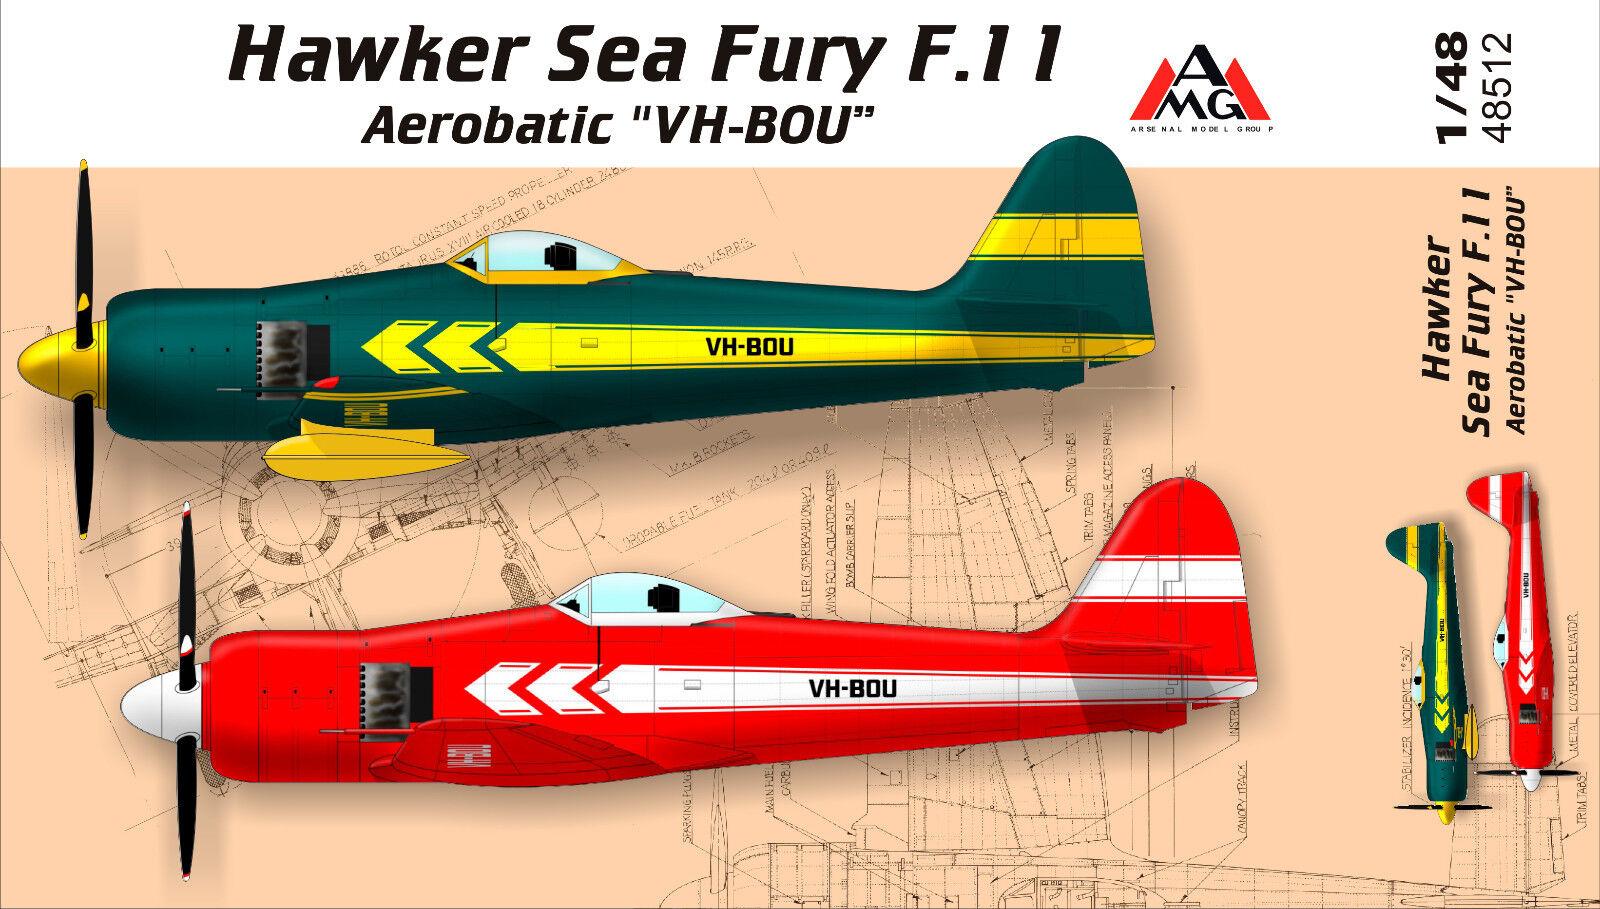 AMG Models - 48512 - Hawker Sea Fury F.11 Aerobatic  VH-BOU  - 1 48     NEW